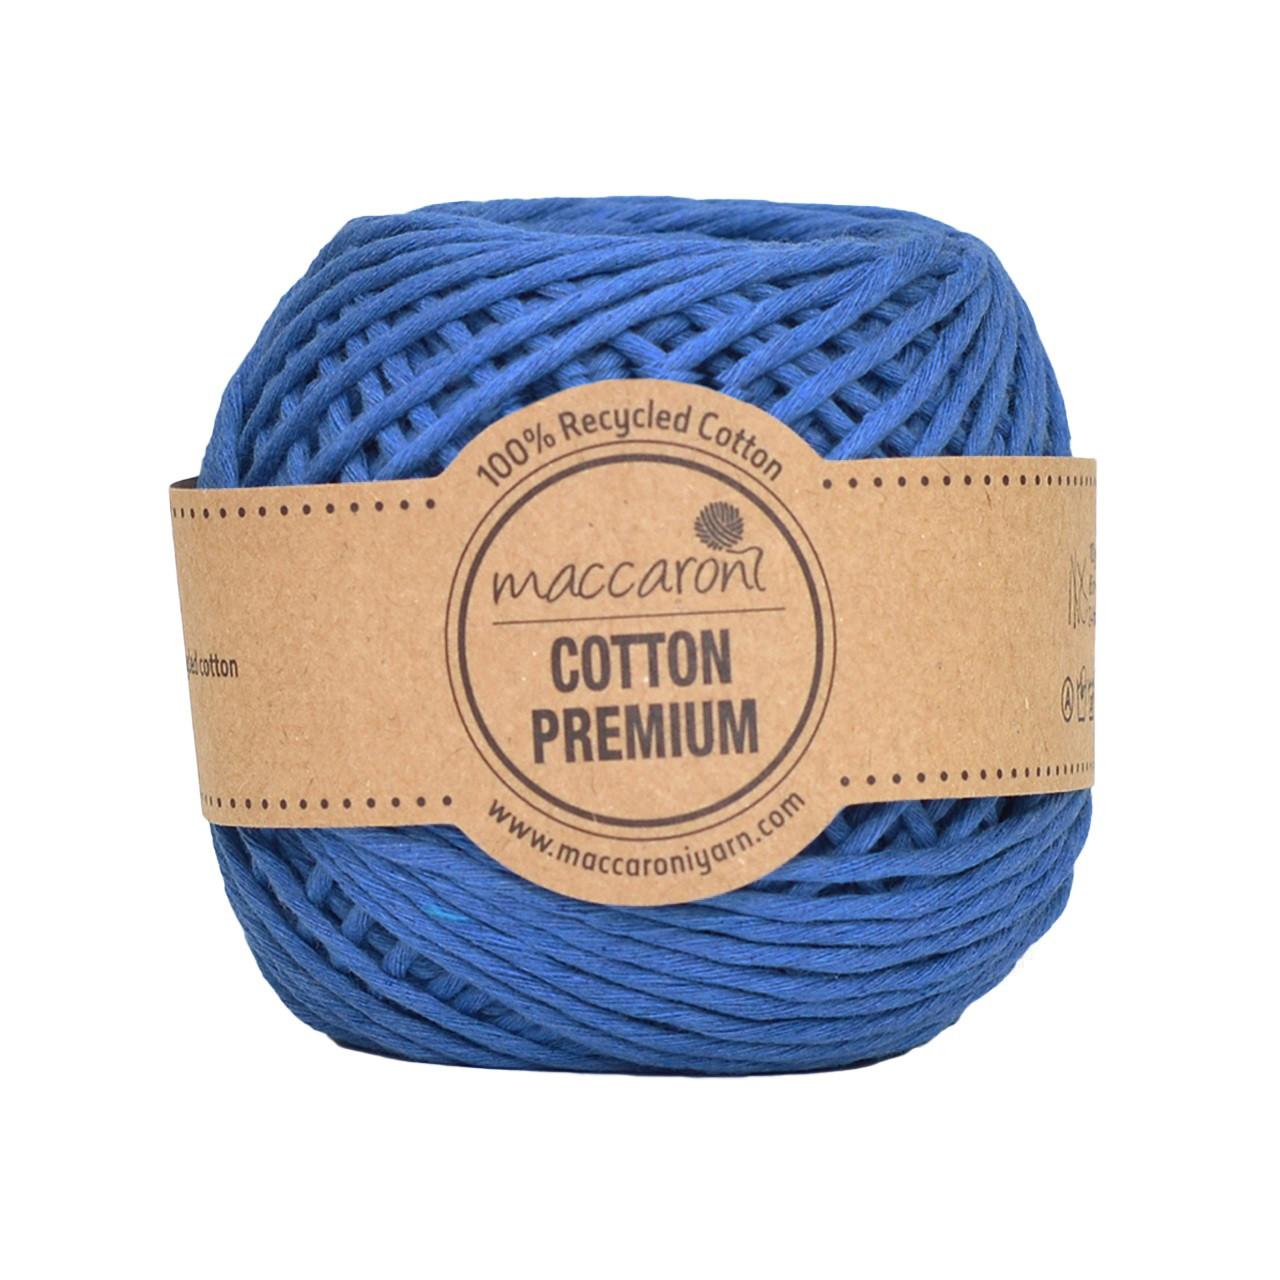 Хлопковый шнур Maccaroni Cotton Premium 2 mm Голубой